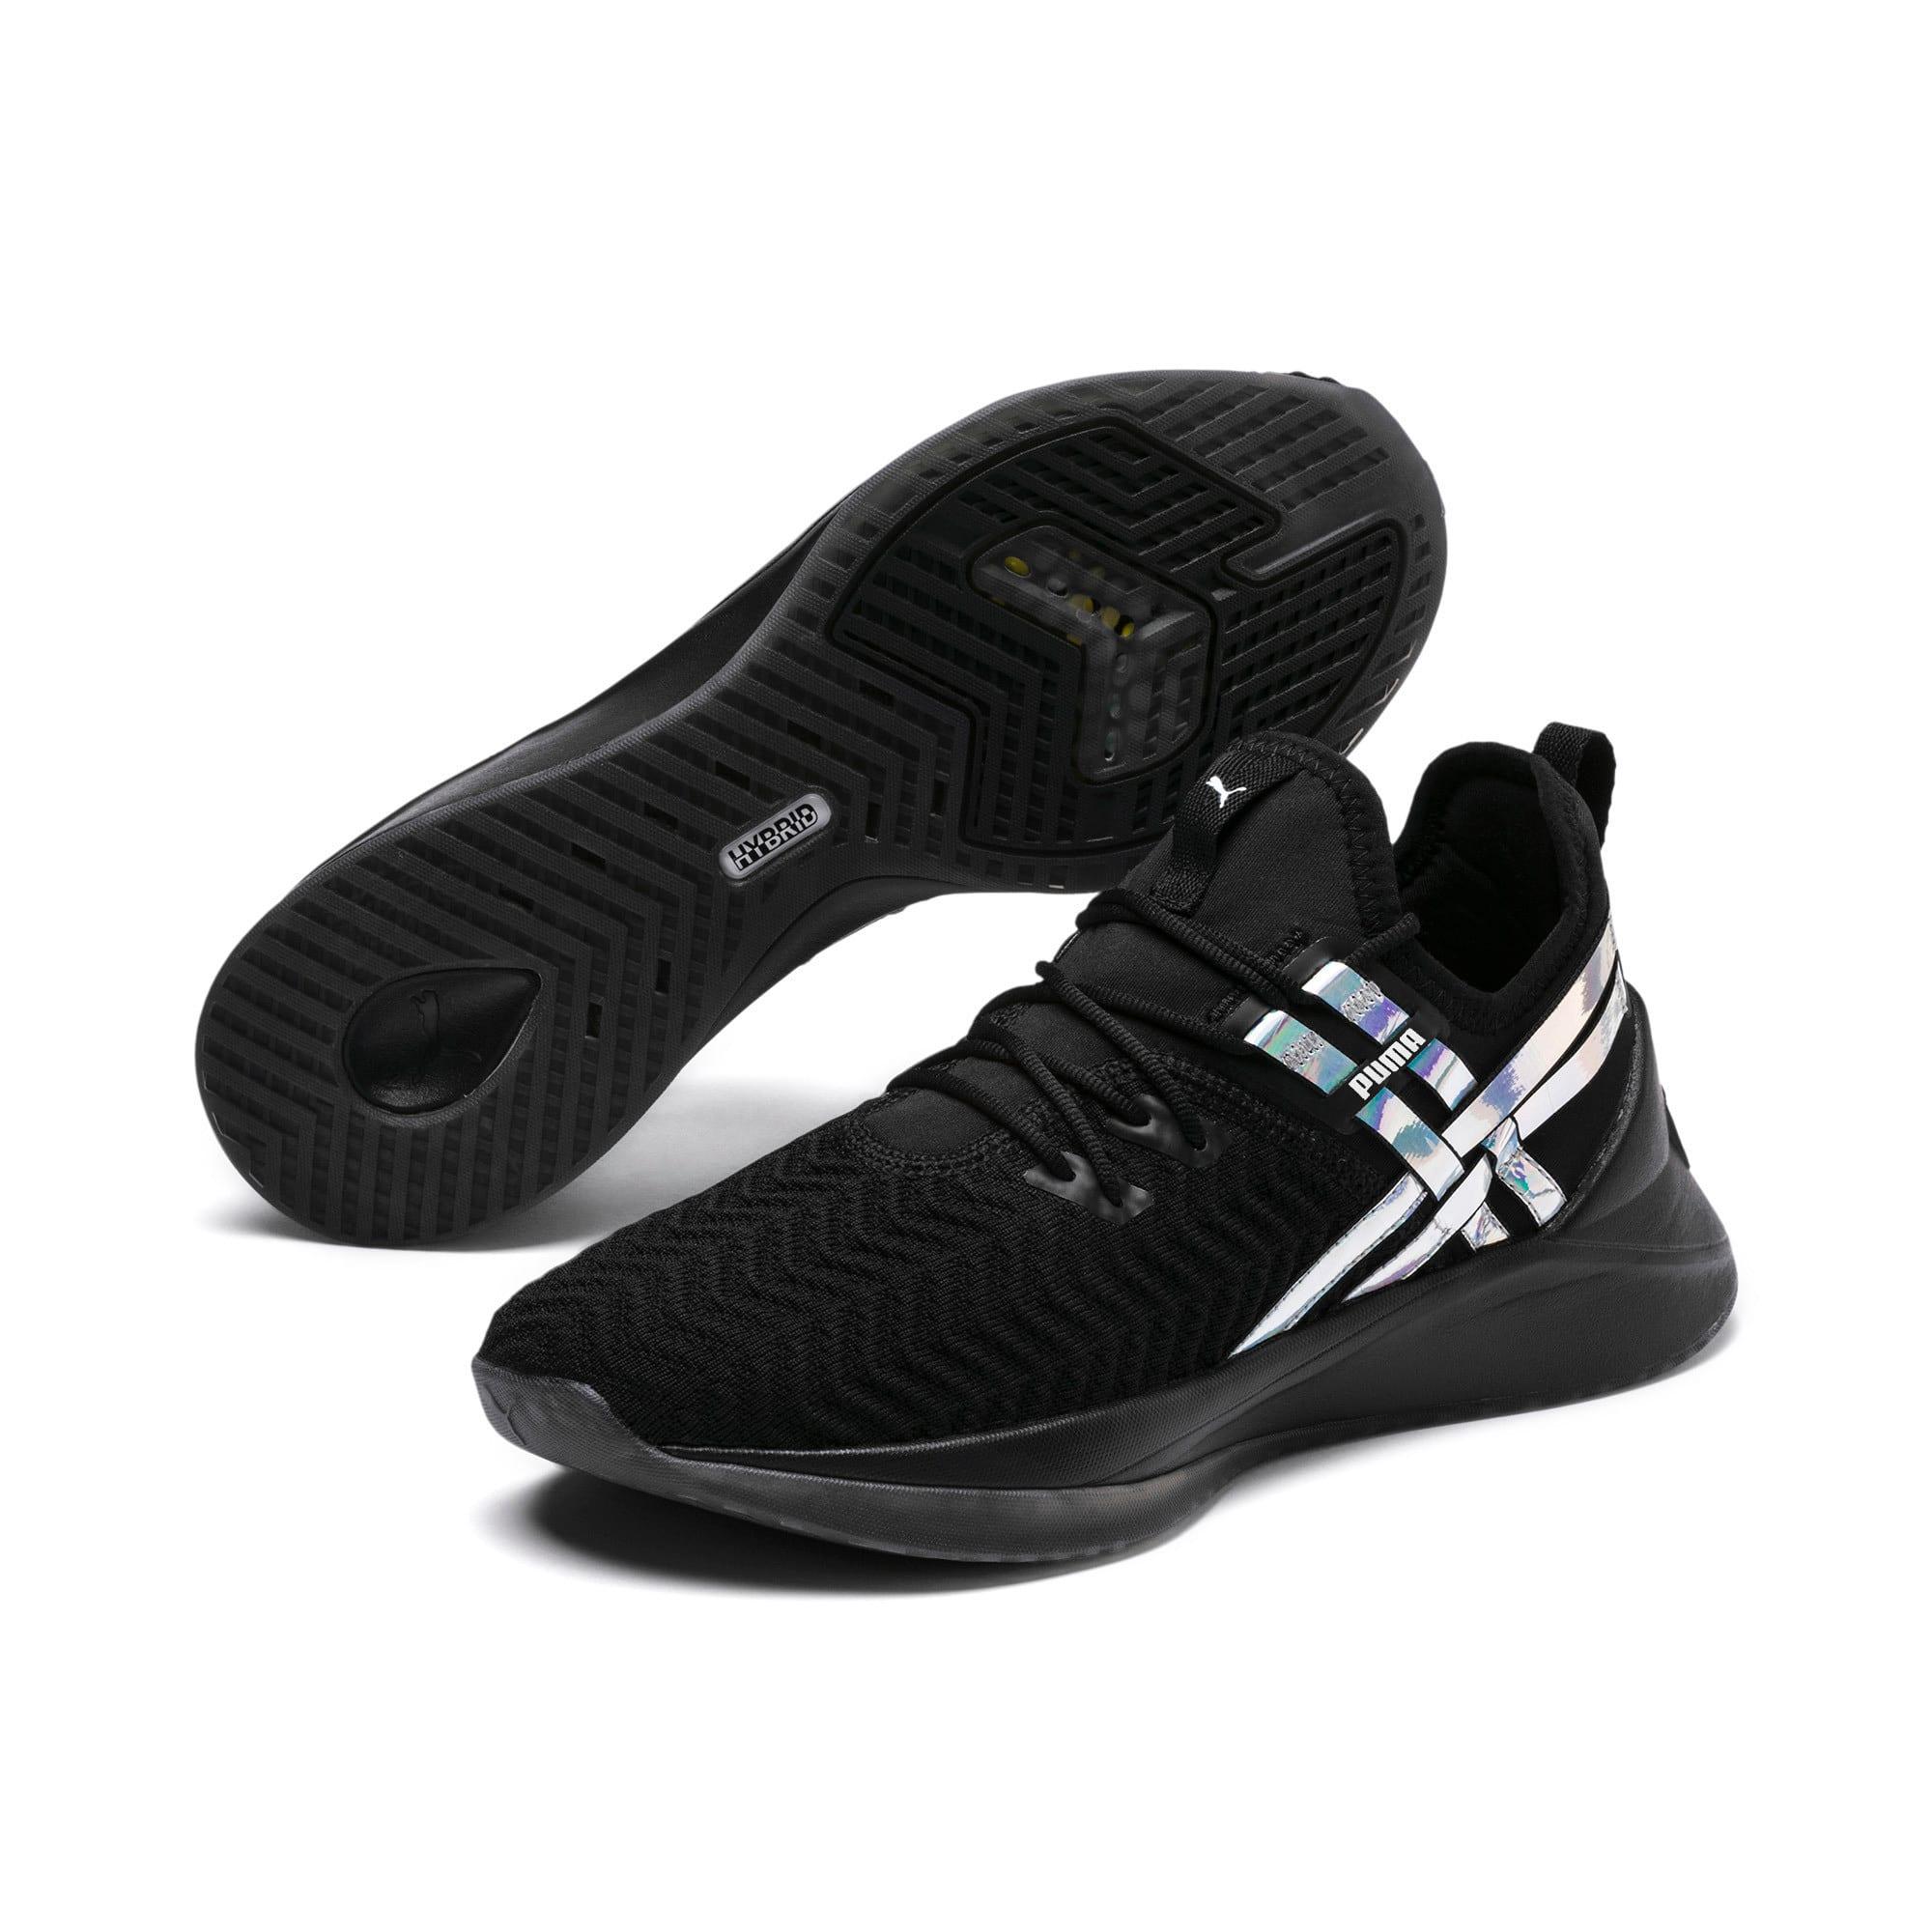 Thumbnail 3 of Jaab XT Iridescent TZ Damen Trainingsschuhe, Puma Black-Puma Black, medium